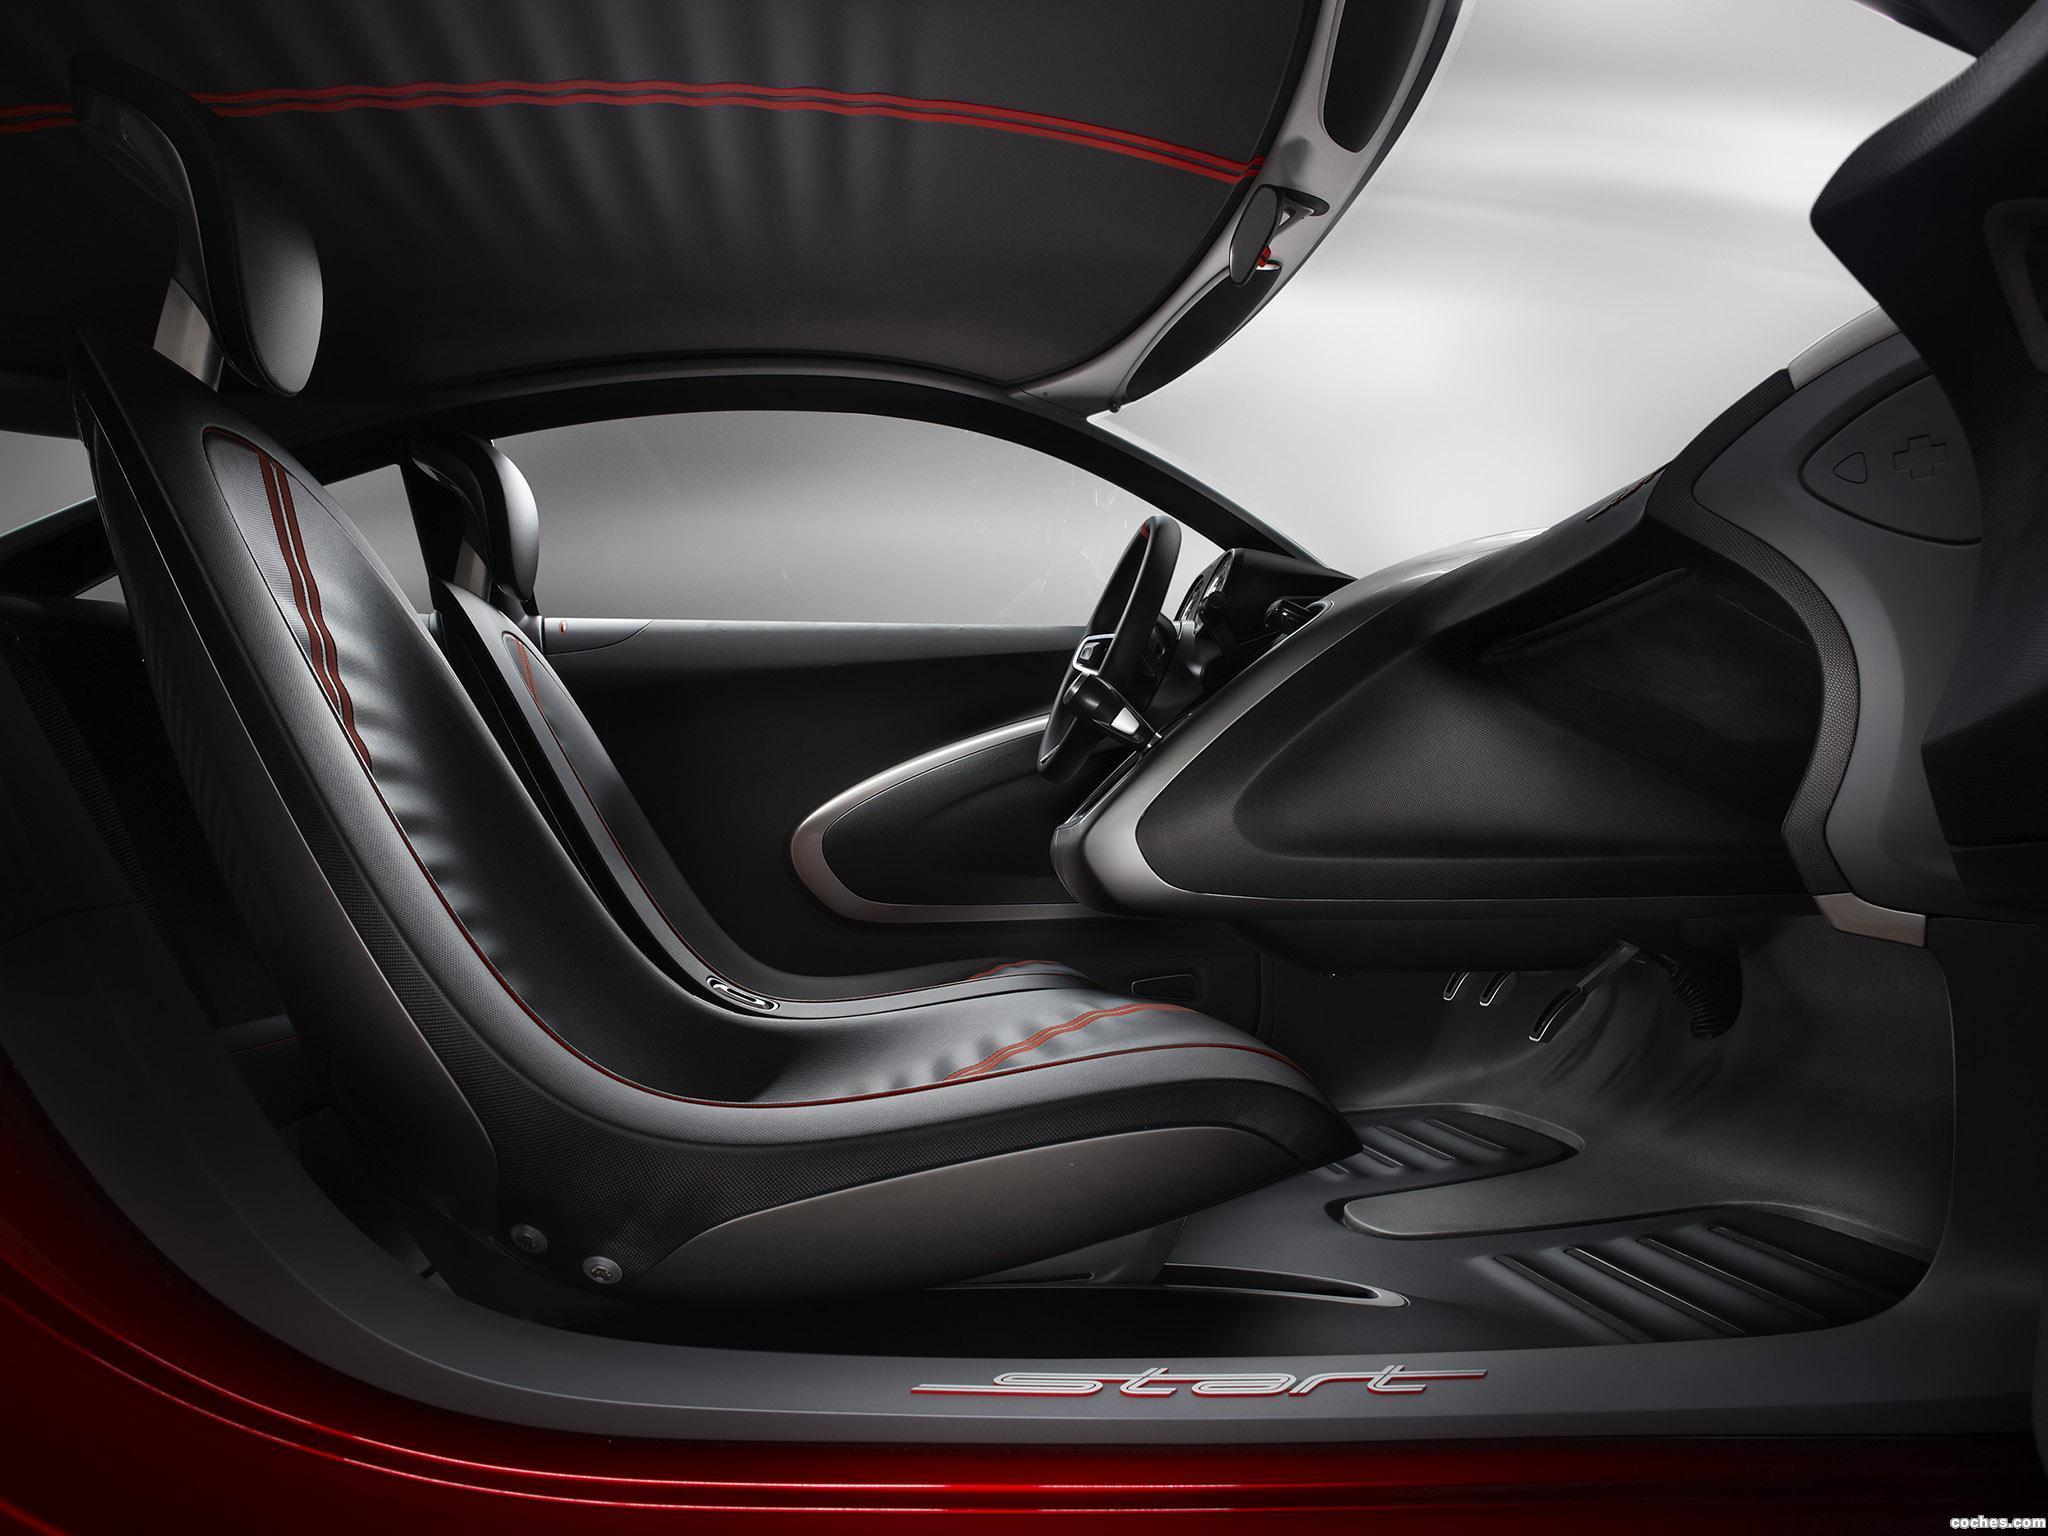 Foto 10 de Ford Start Concept 2010